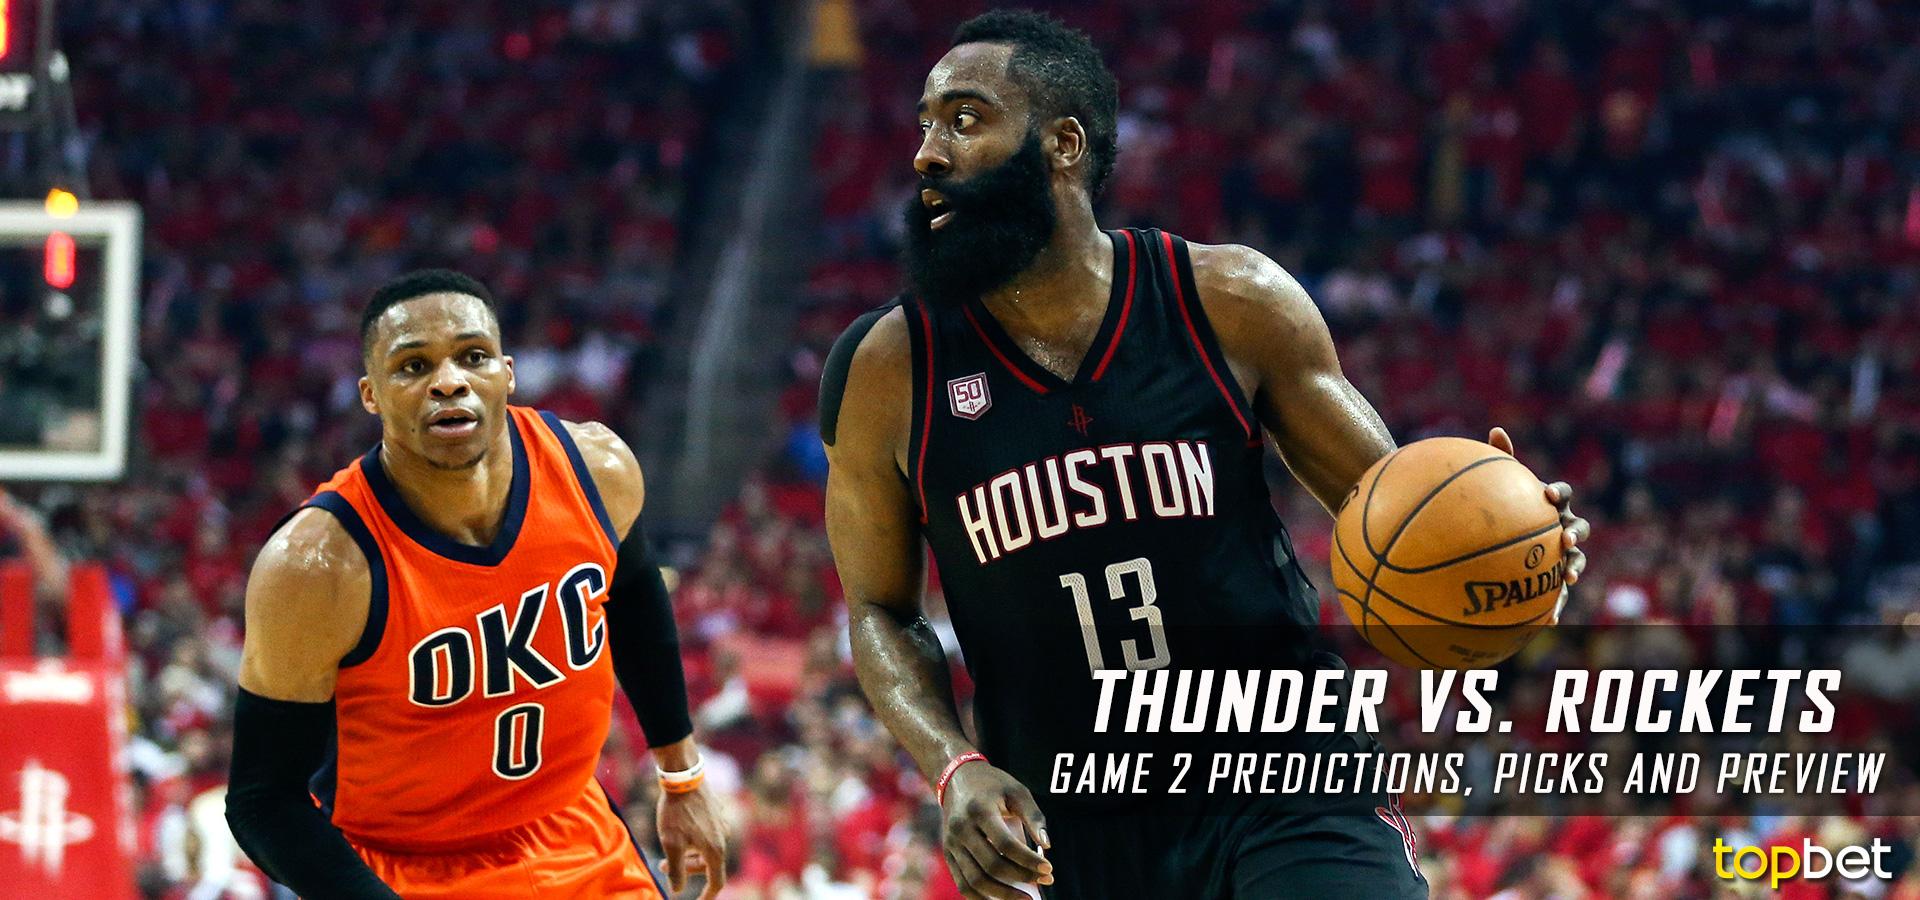 Thunder vs Rockets Series Game 2 Predictions, Picks & Preview